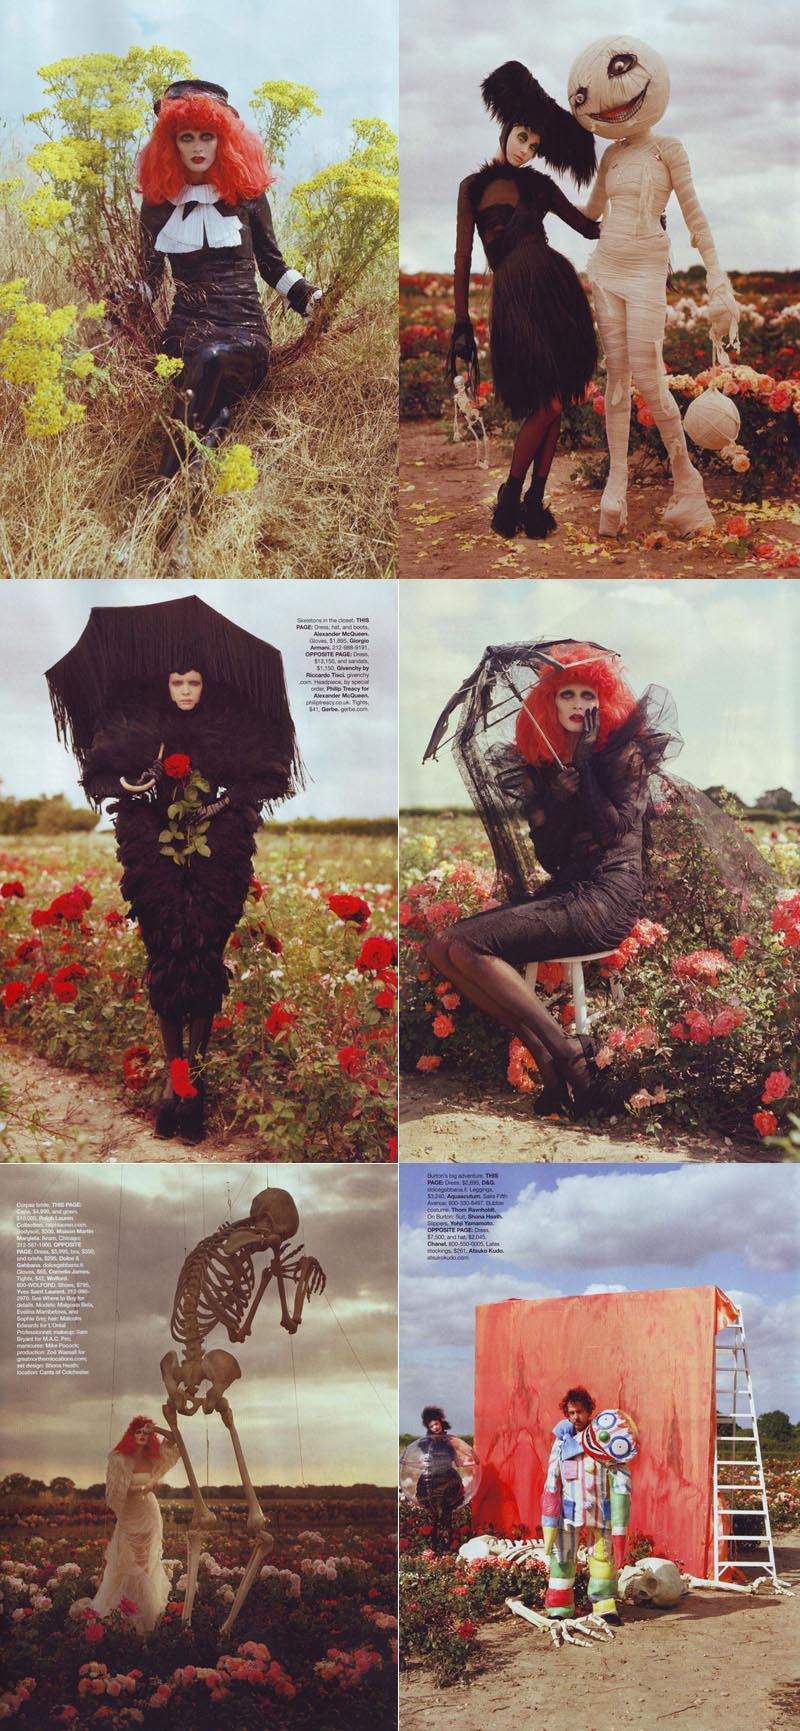 Spokes 'n' Daggers: Tim Burton for Harper's Bazaar